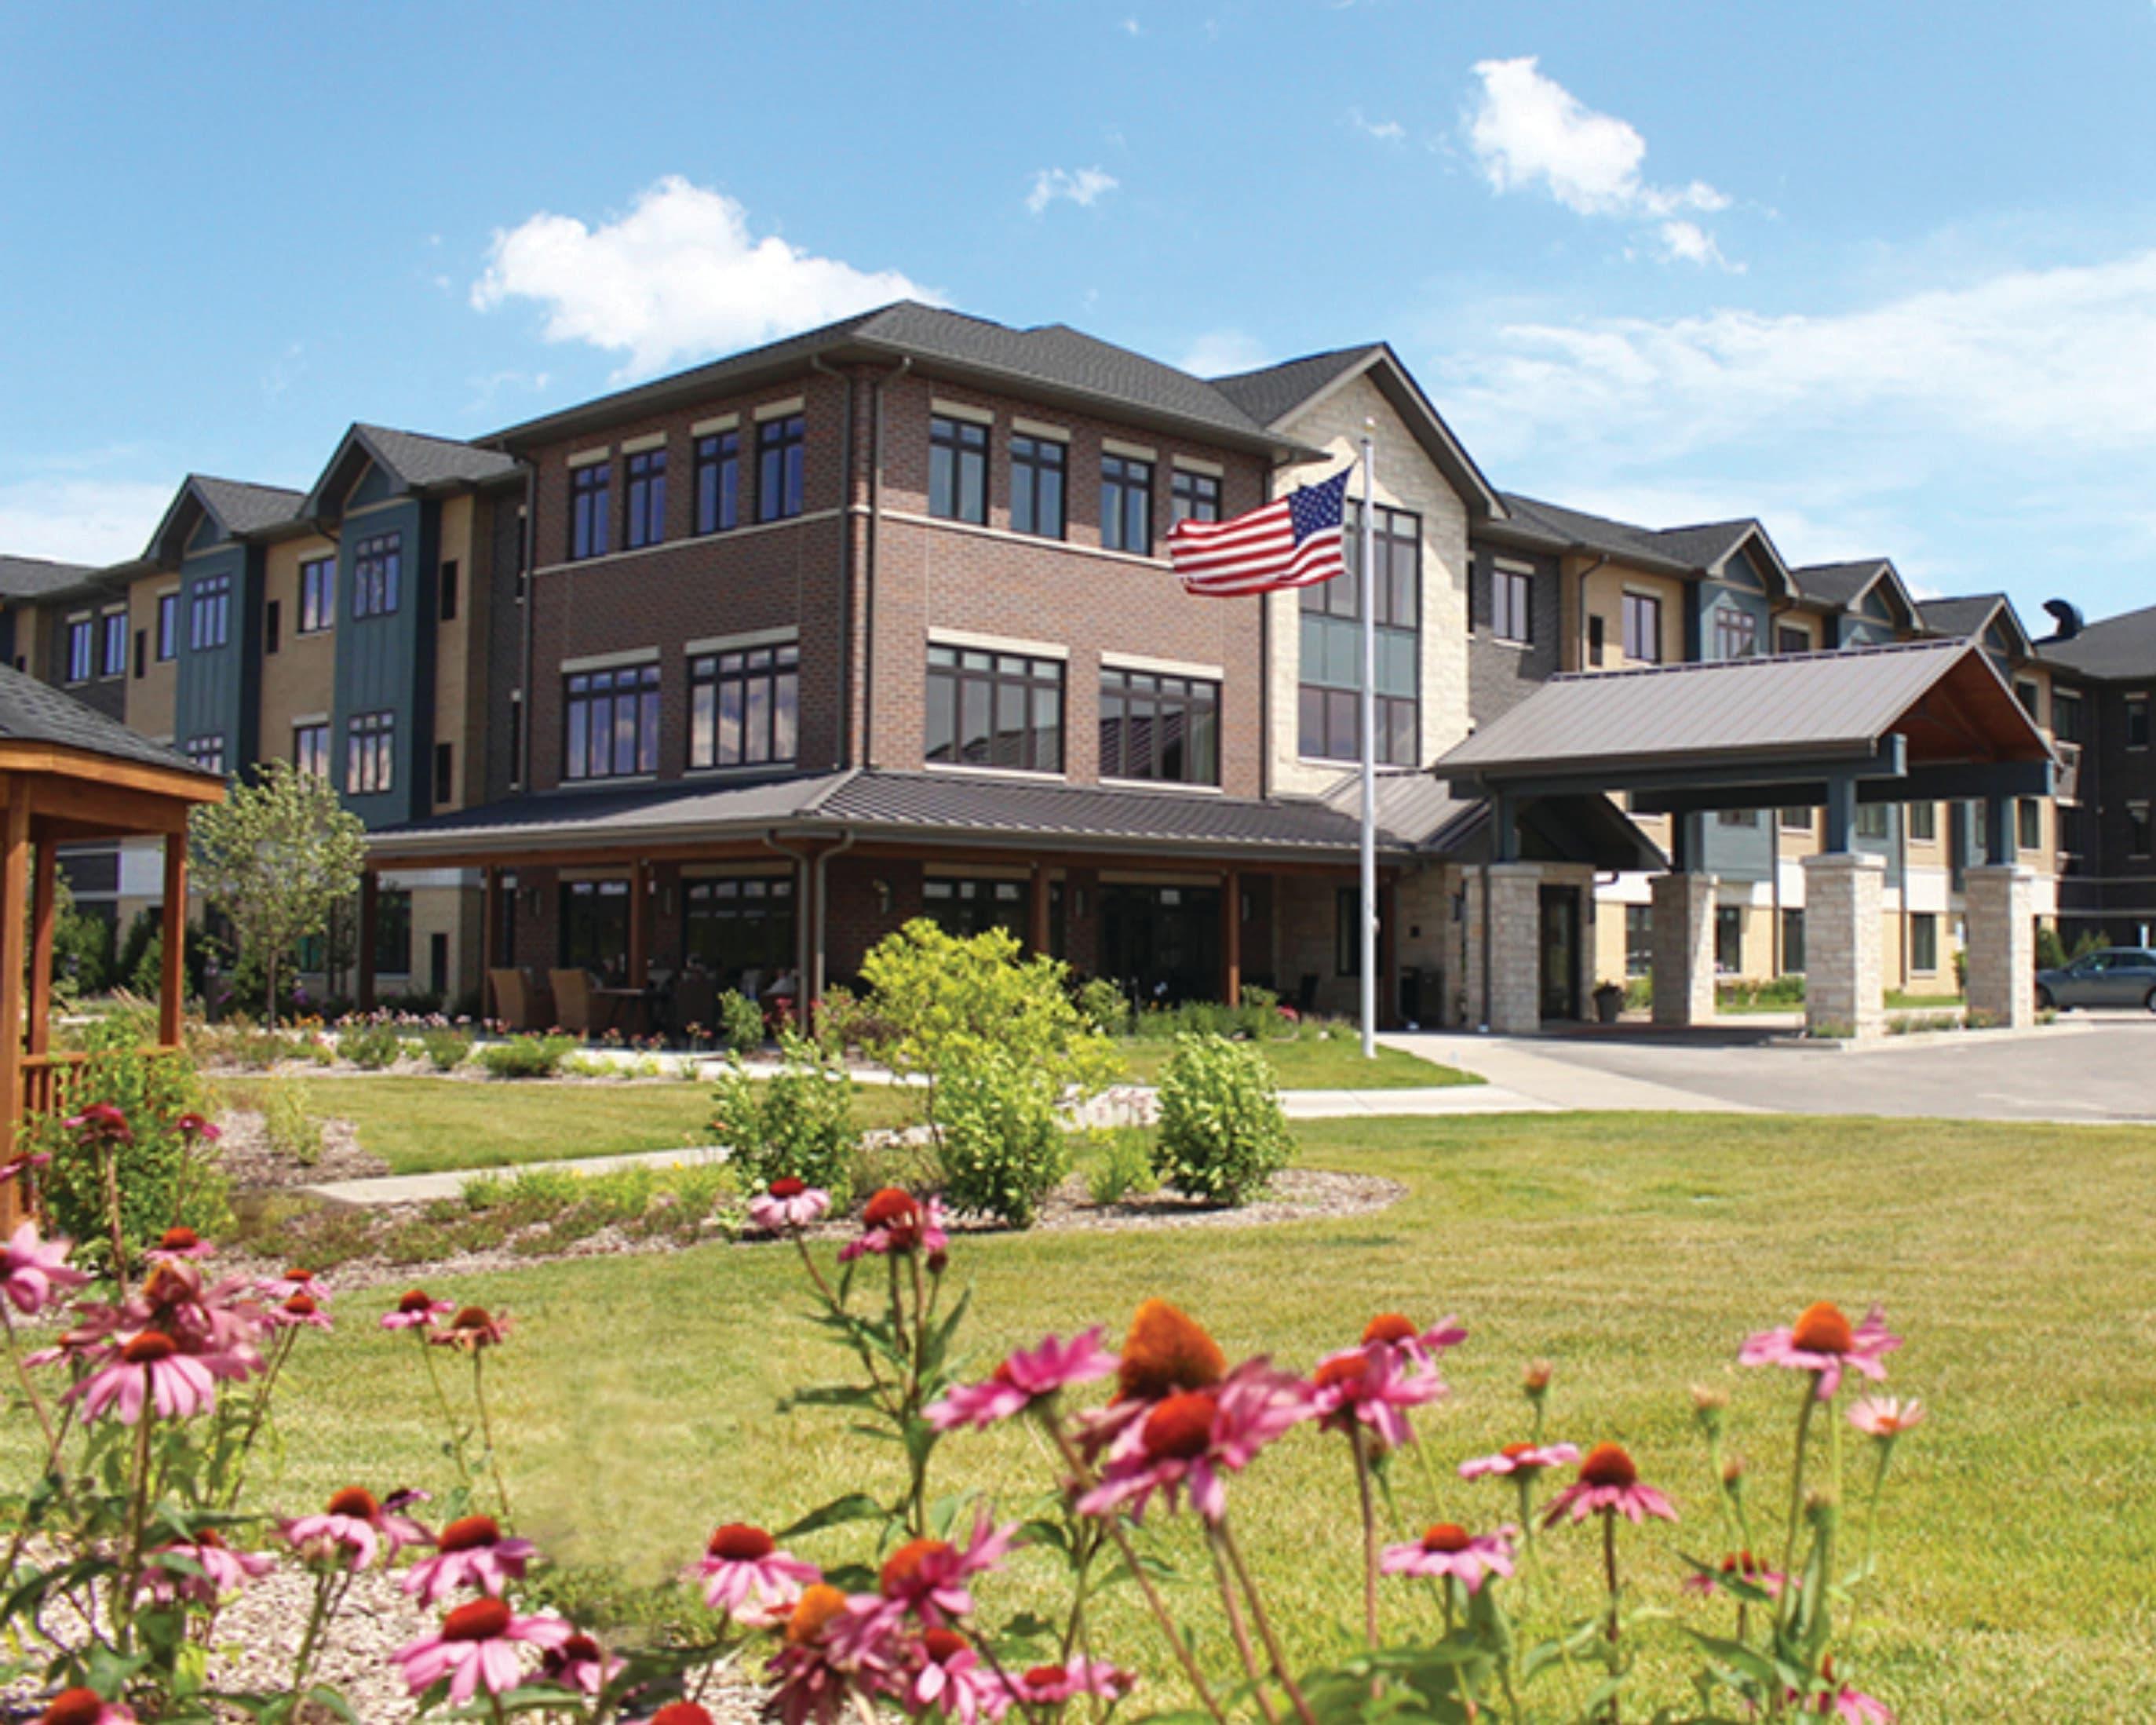 Photo 1 of Evergreen Senior Living - Orland Park